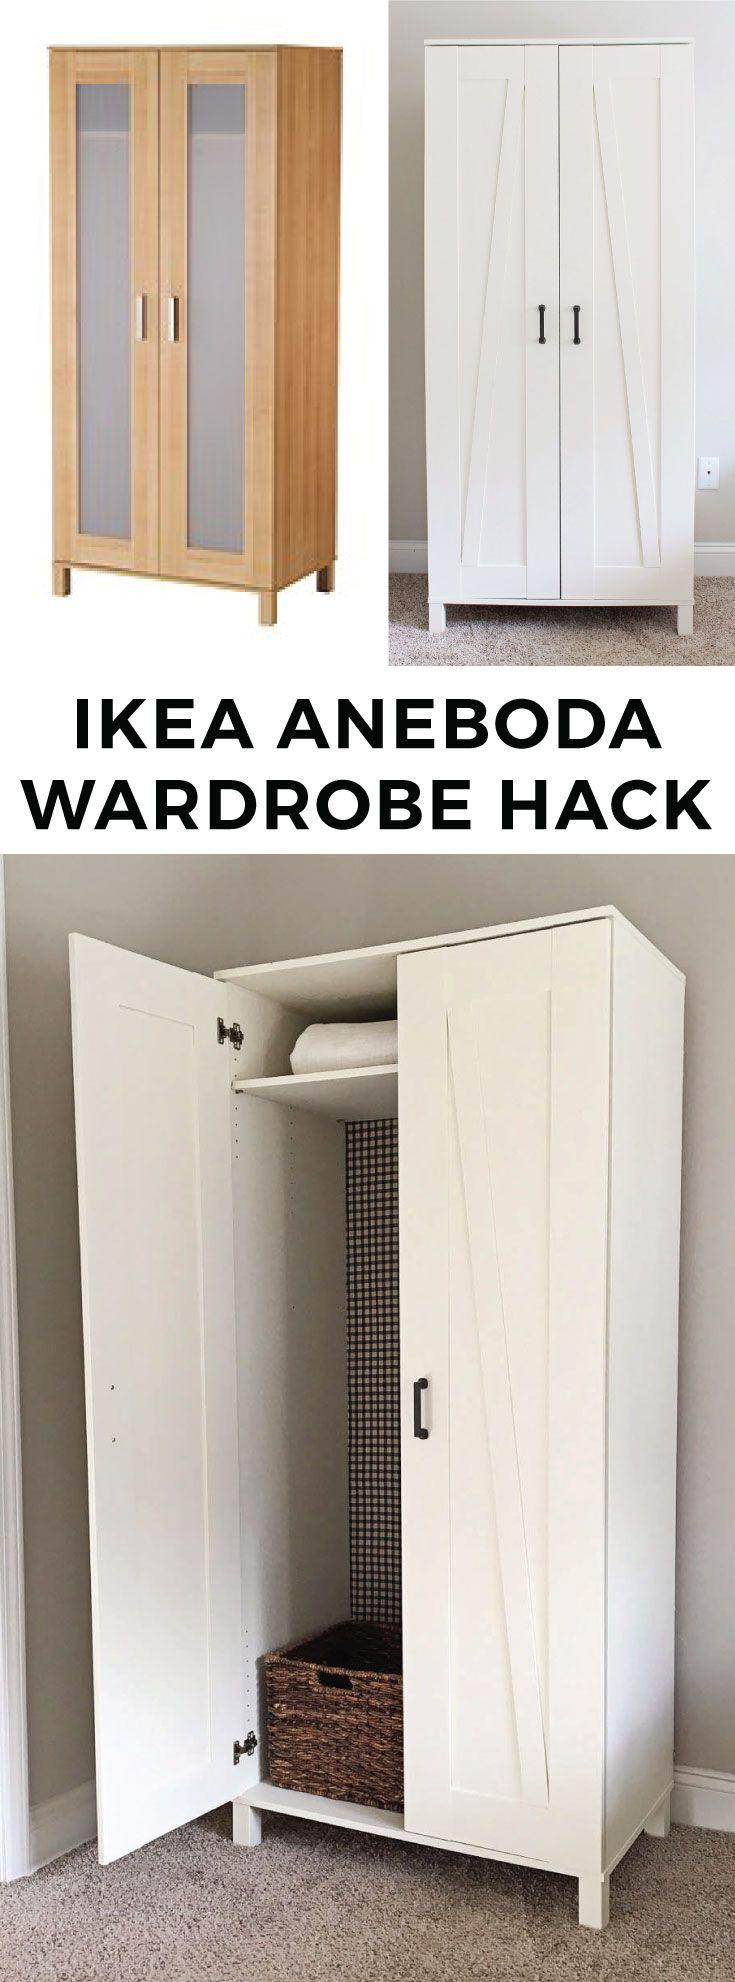 Hackear Muebles De Ikea Hackear Muebles De Ikea With Hackear  # Hackeando Muebles De Ikea